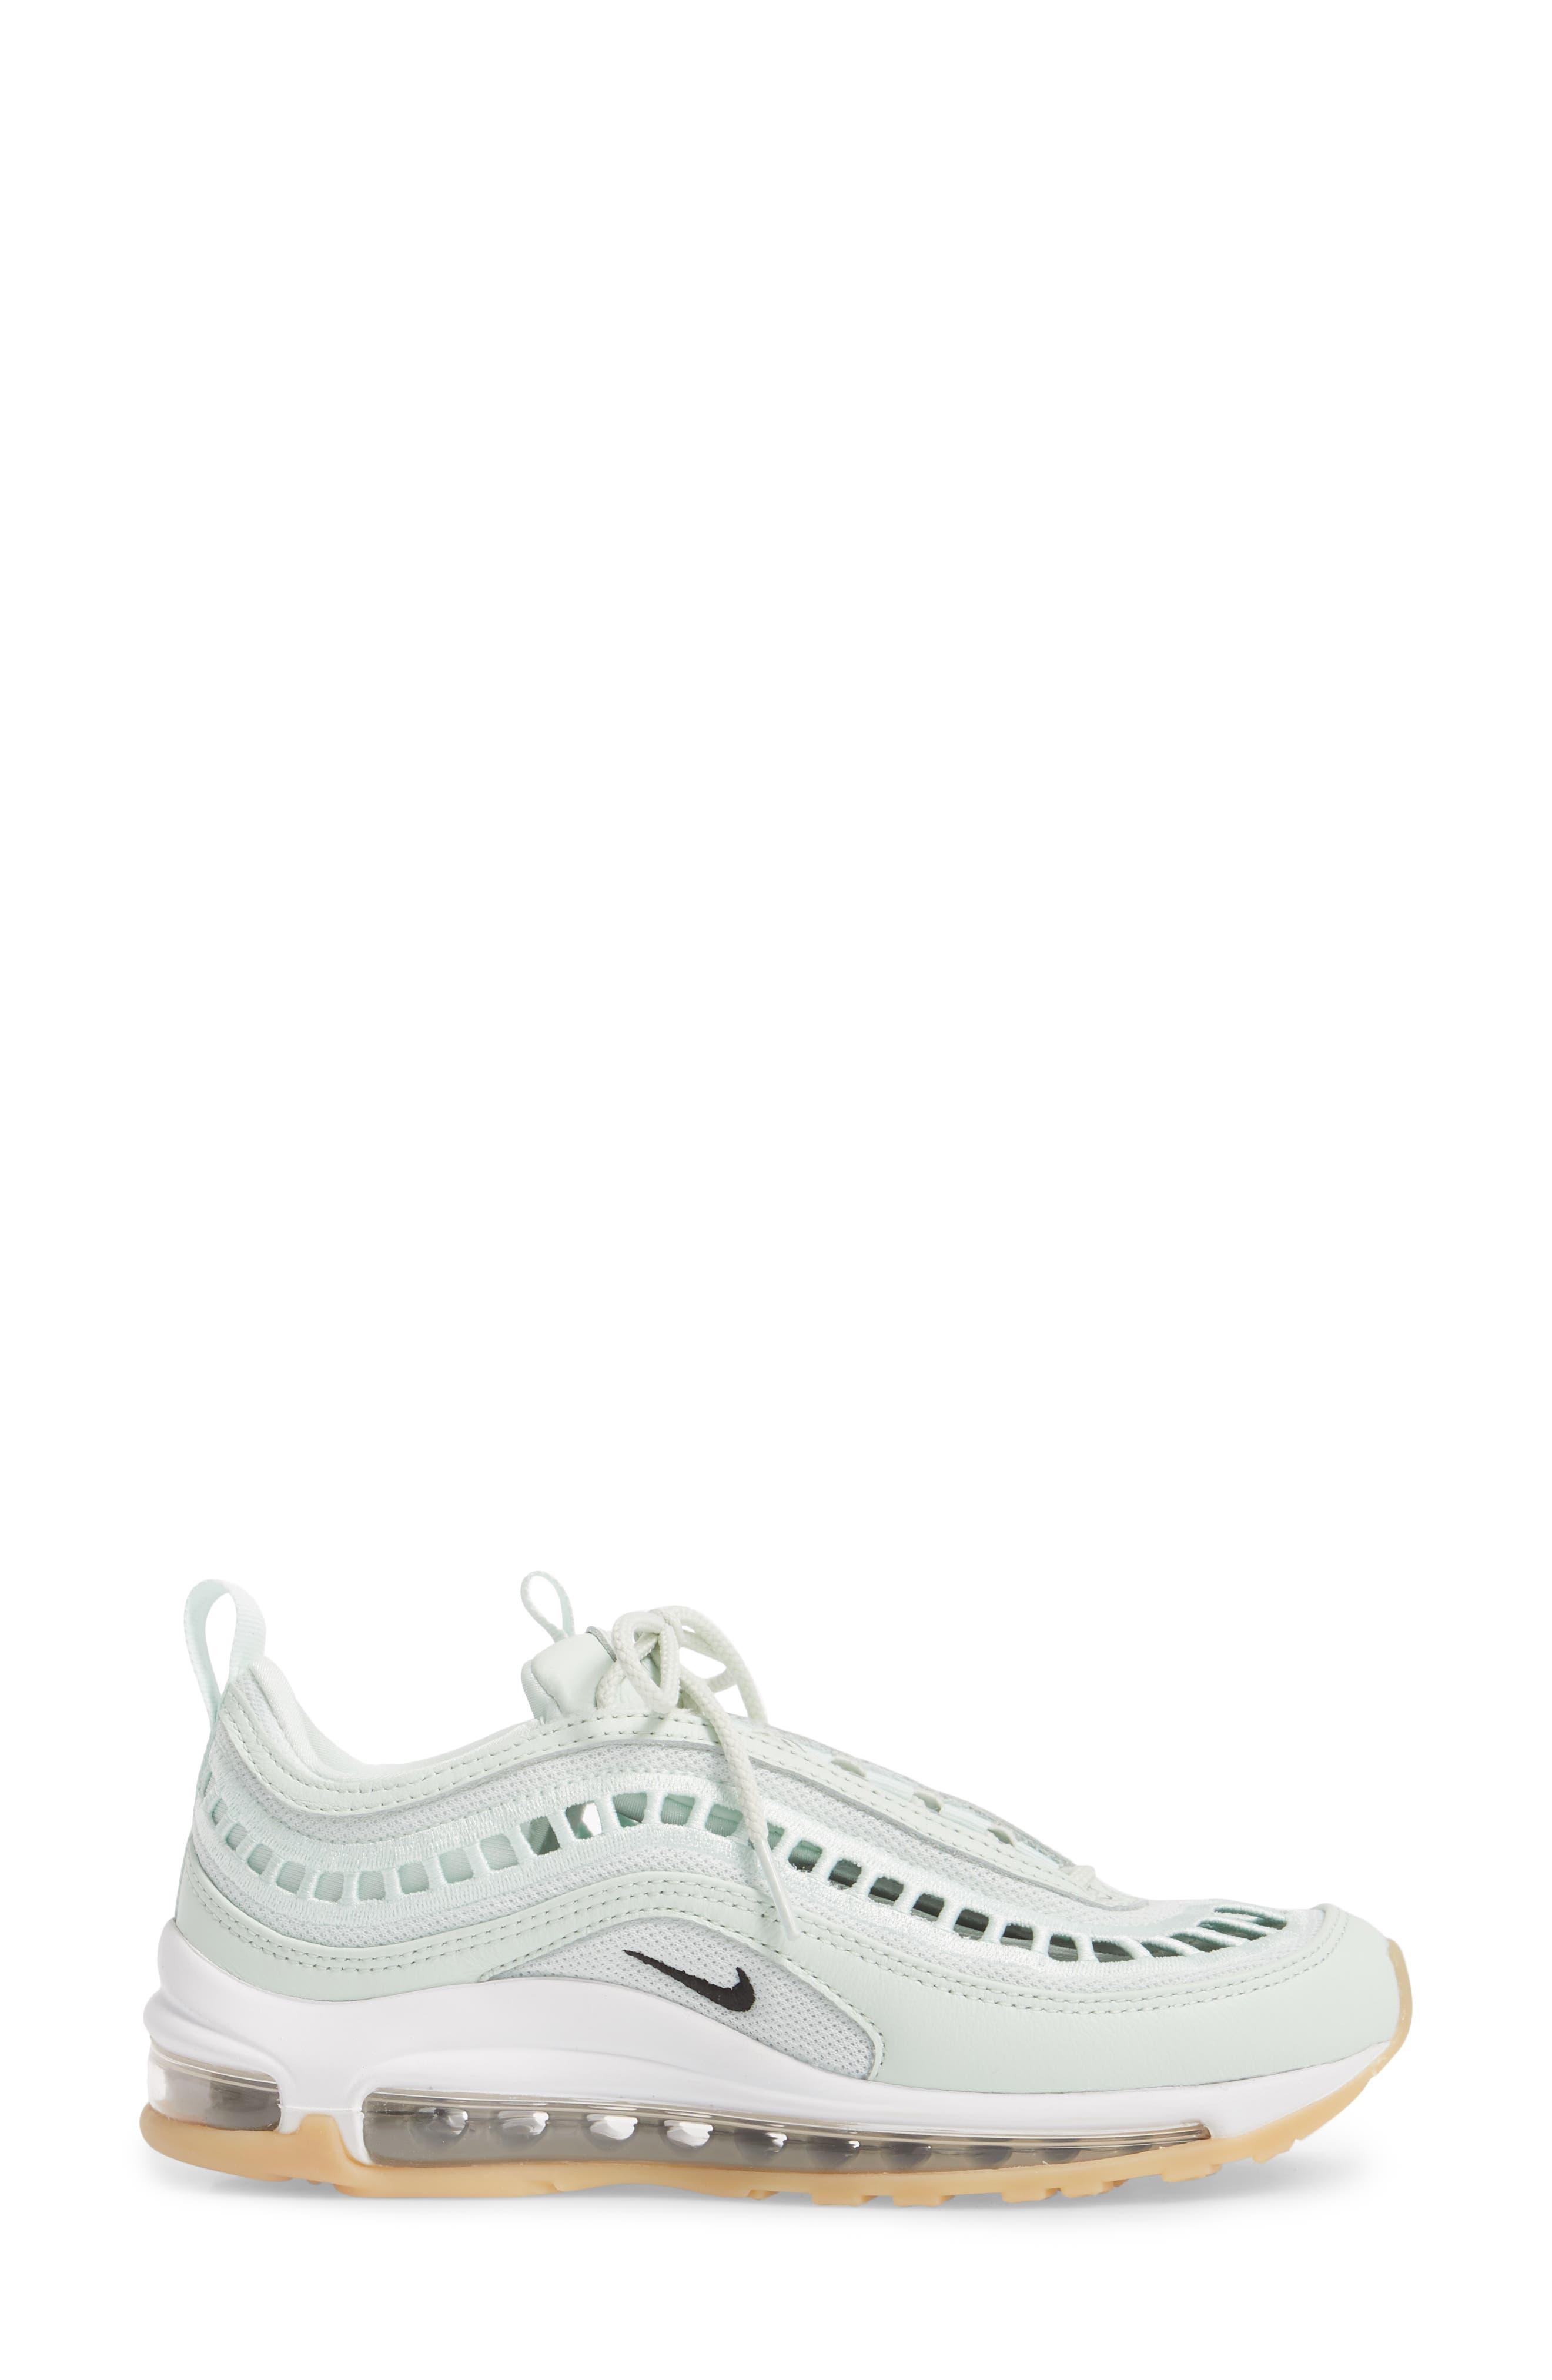 Air Max 97 Ultra '17 SI Sneaker,                             Alternate thumbnail 3, color,                             020